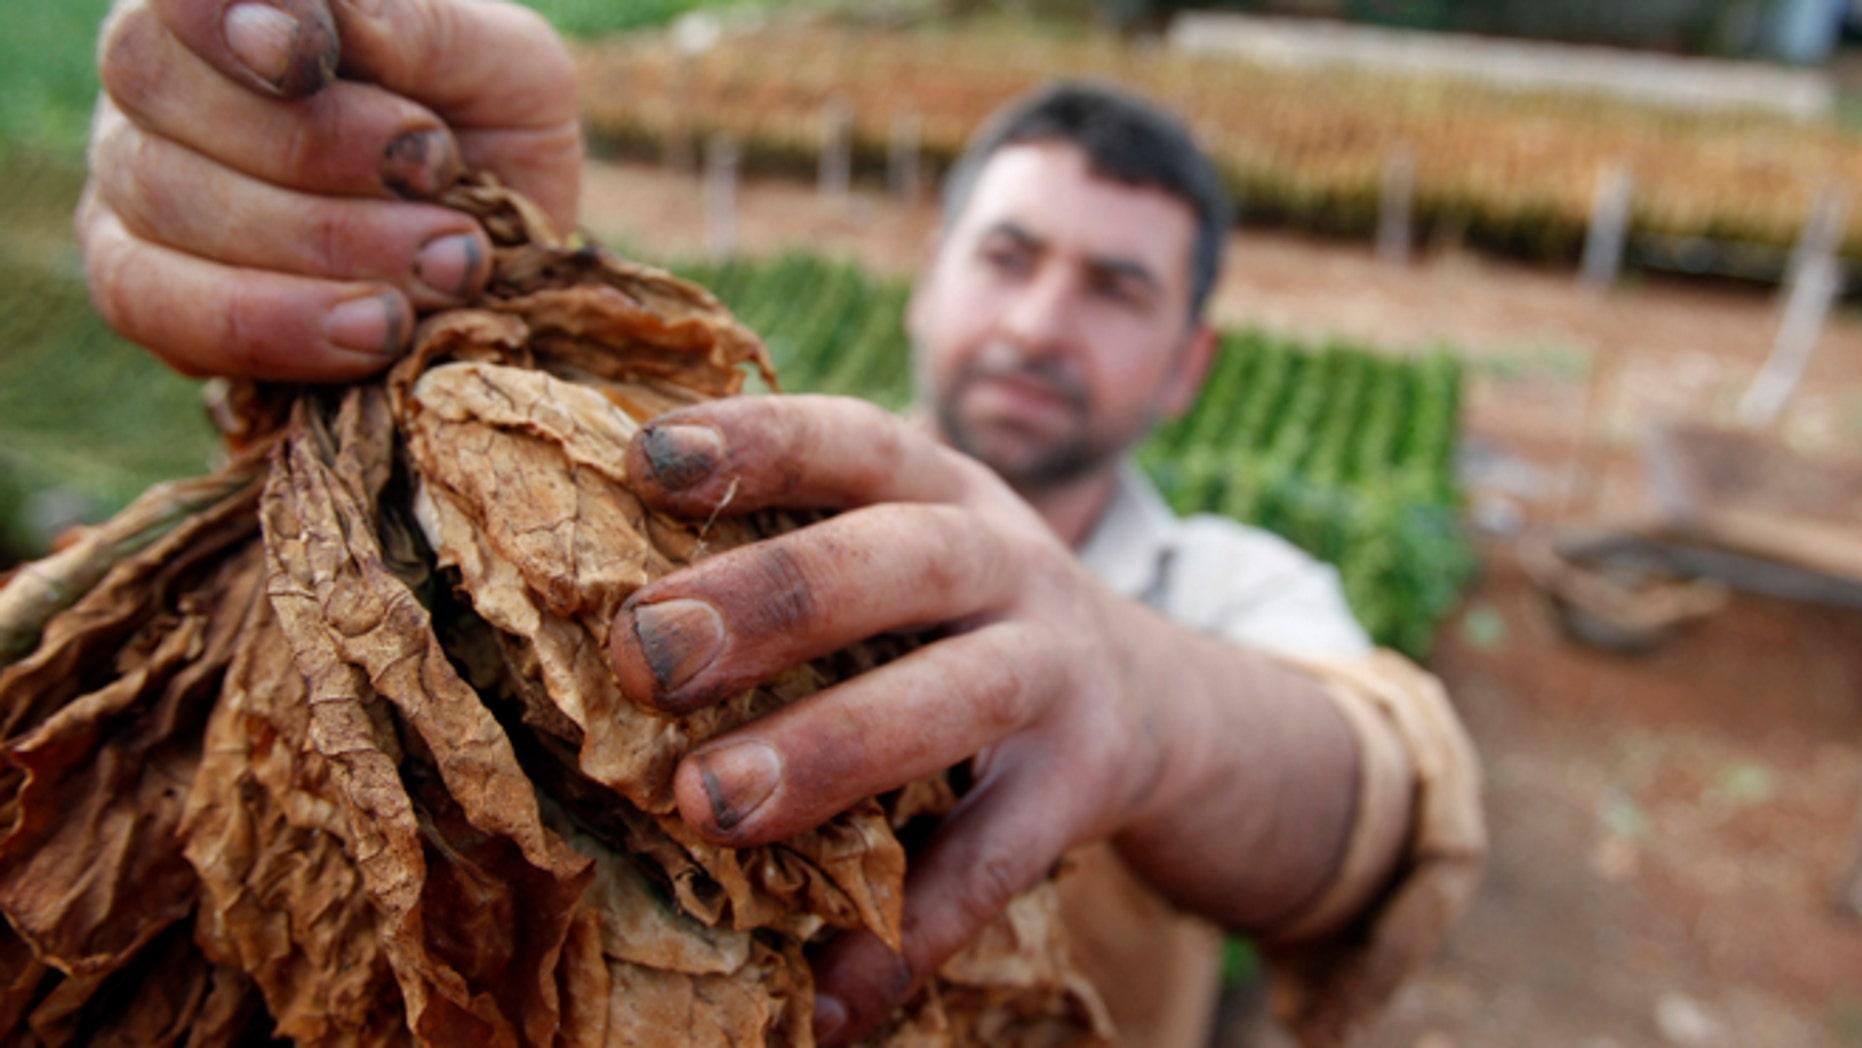 A farmer holds tobacco leaves in Aitaroun, south Lebanon, June 7, 2014. REUTERS/Ali Hashisho